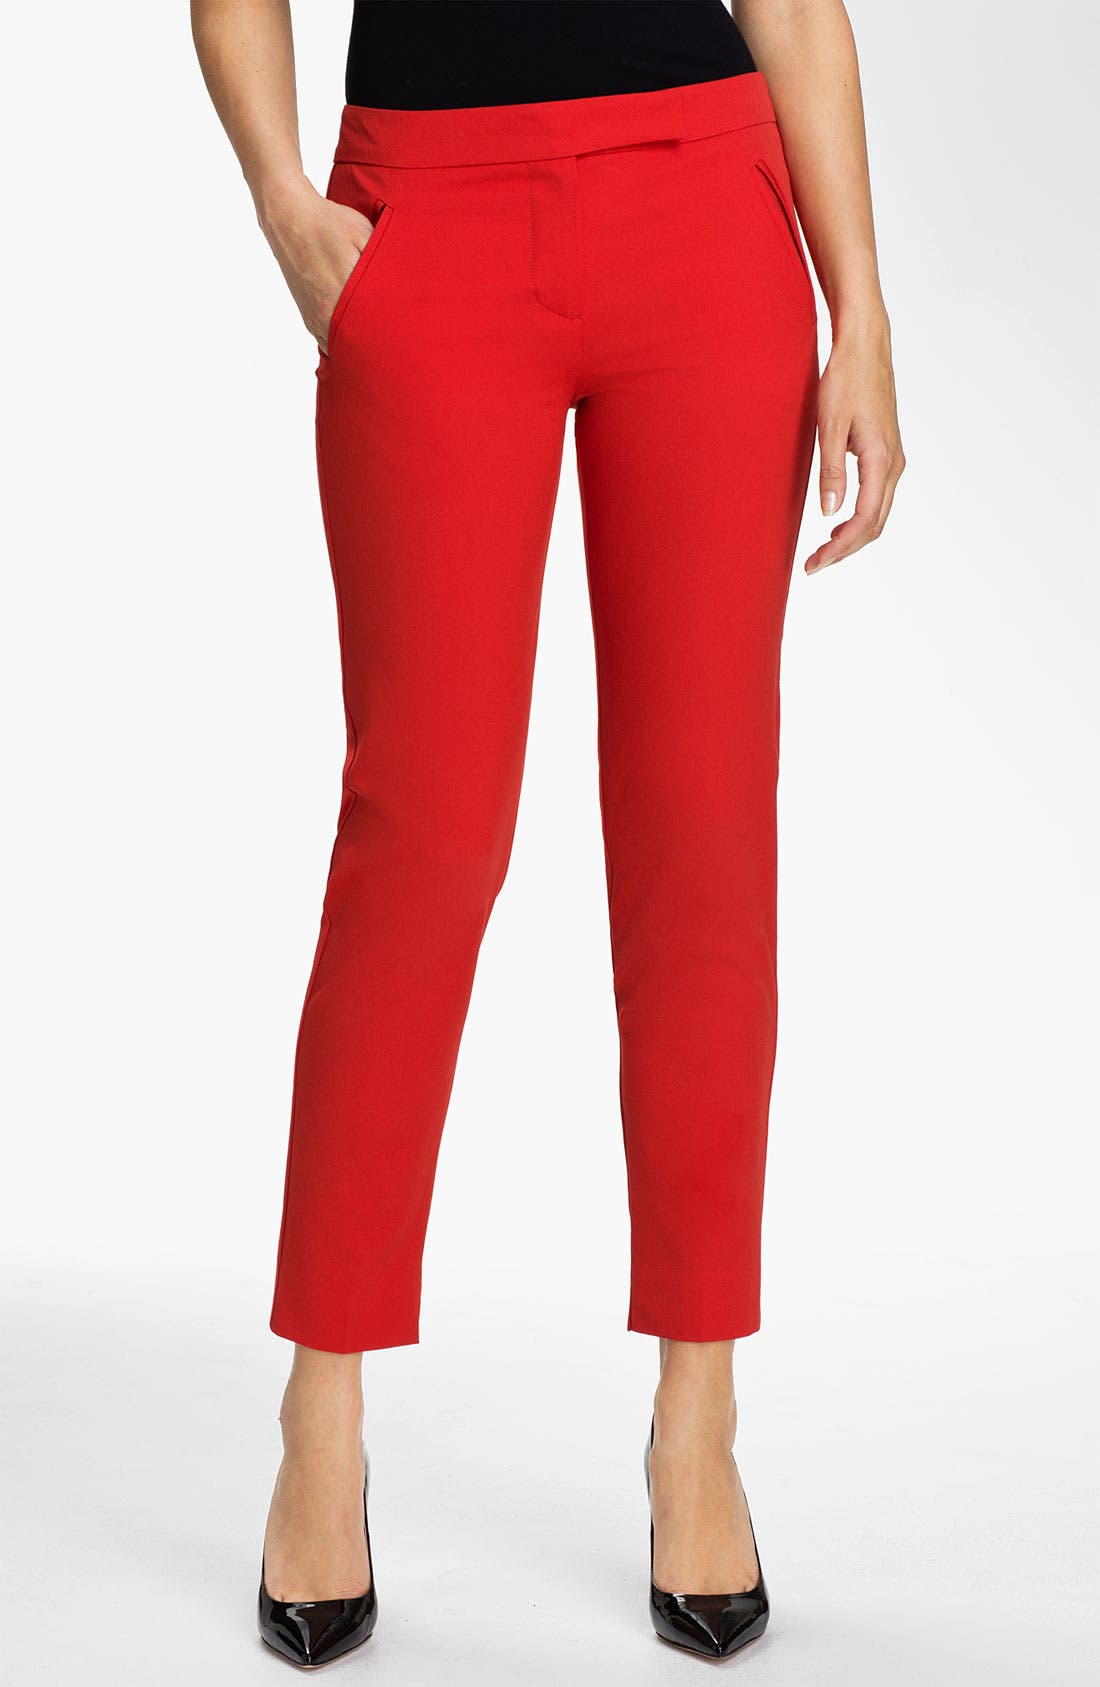 Main Image - Trina Turk 'Solitaire' Skinny Pants